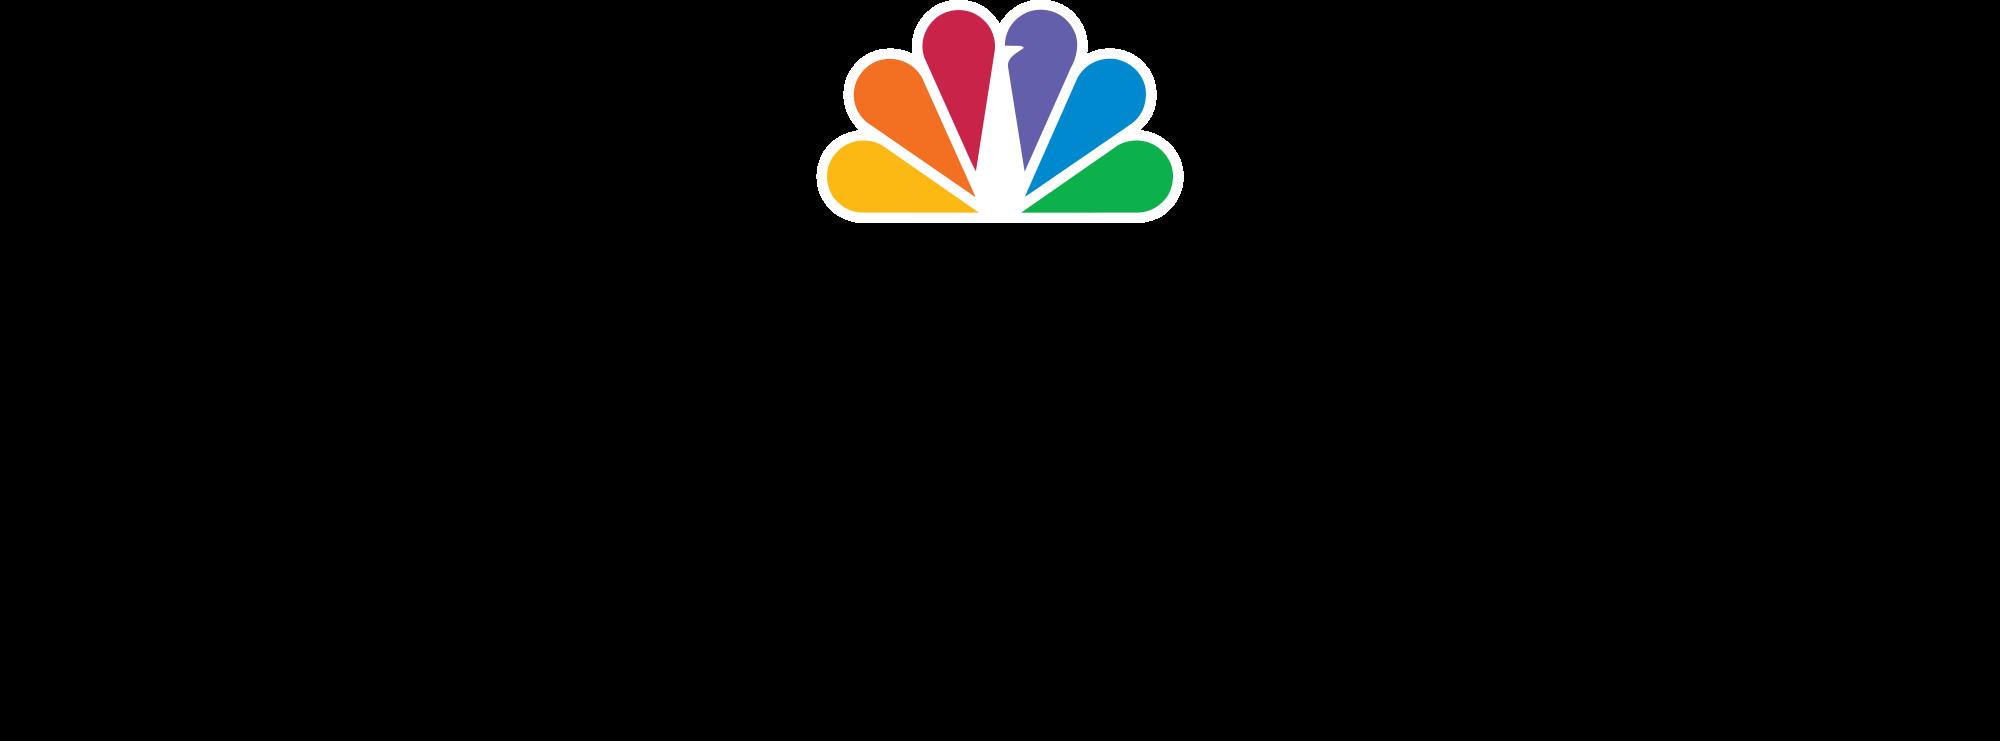 Comcast NBCUniversal